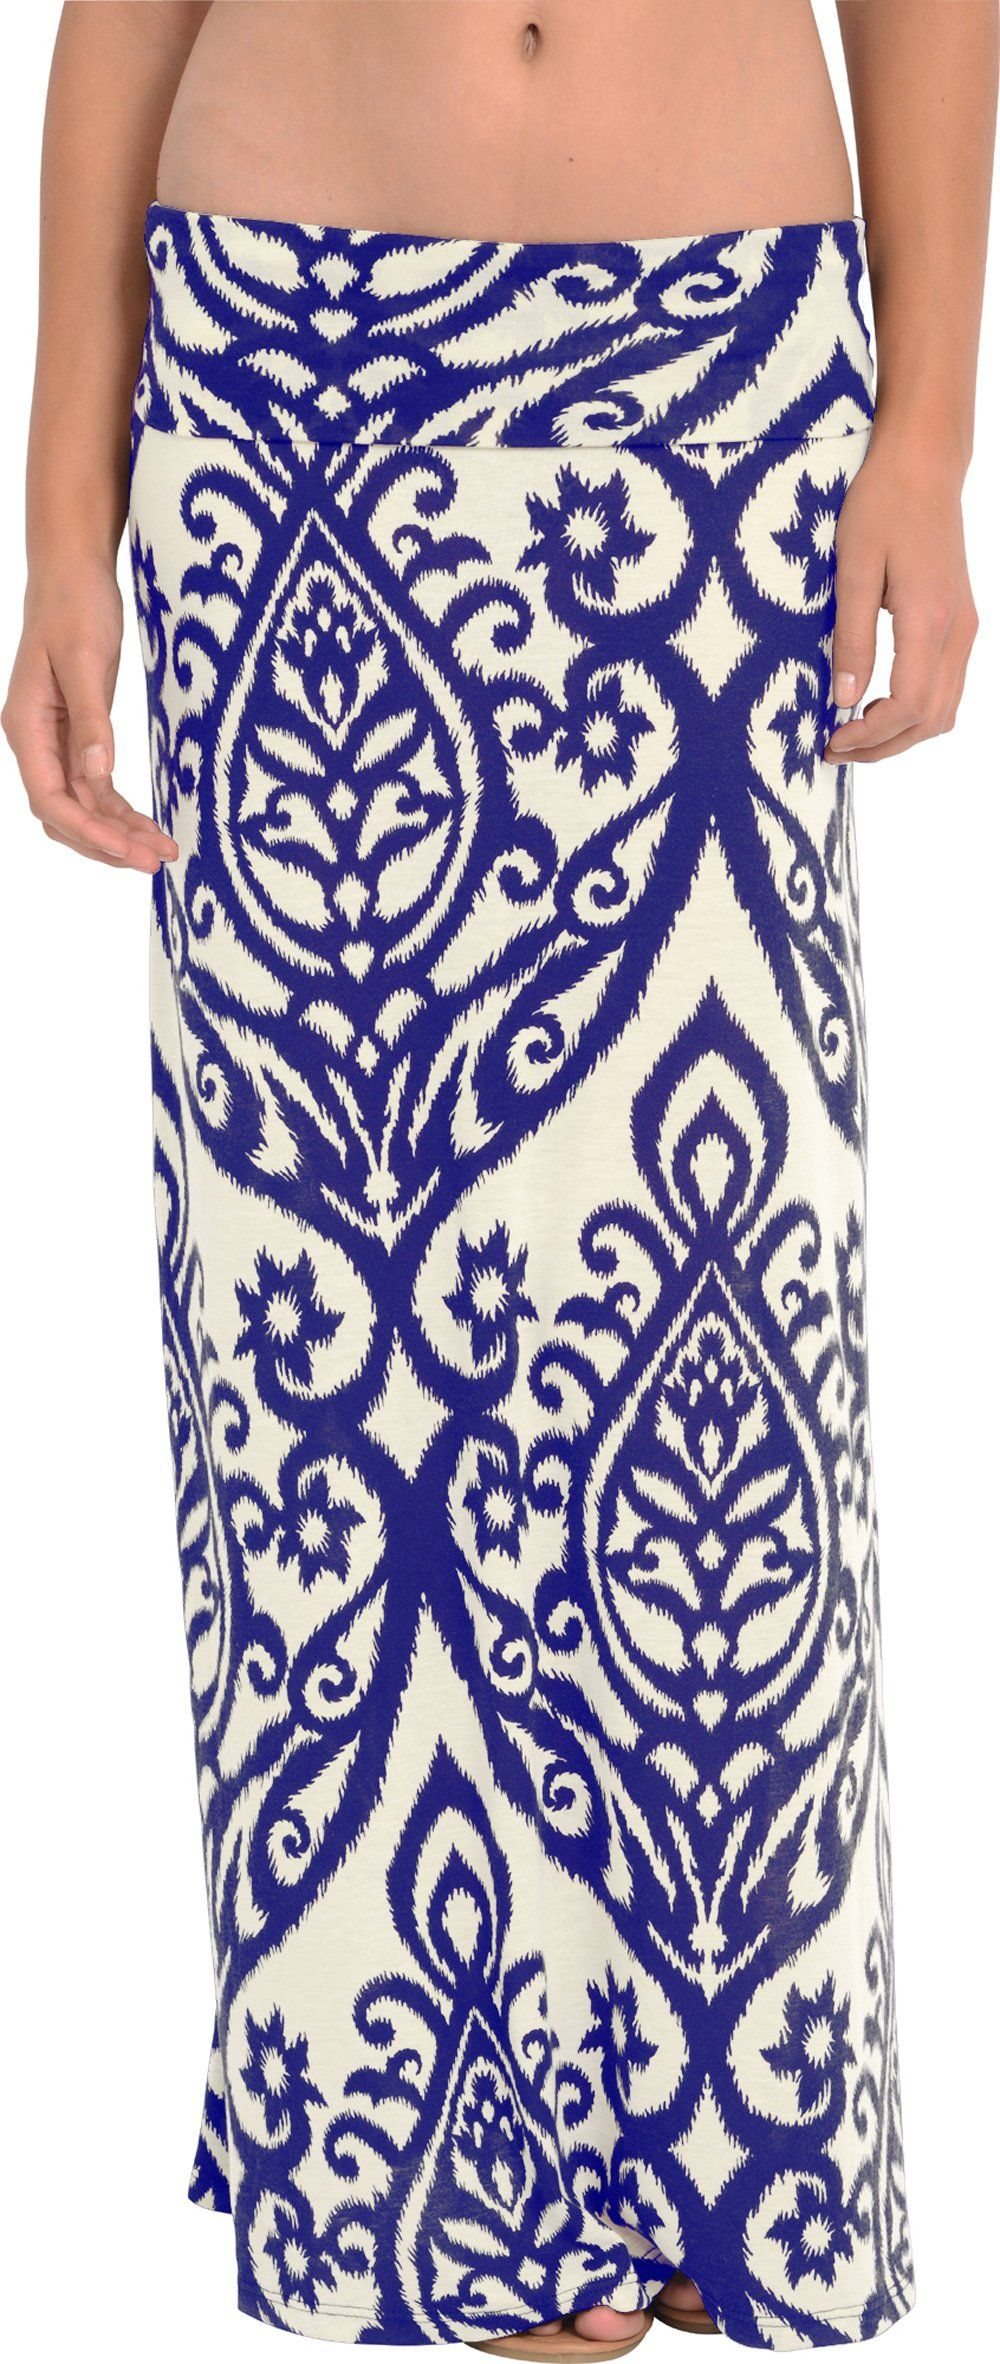 Candelabra Print Maxi Skirt, S, Ivory-Royal